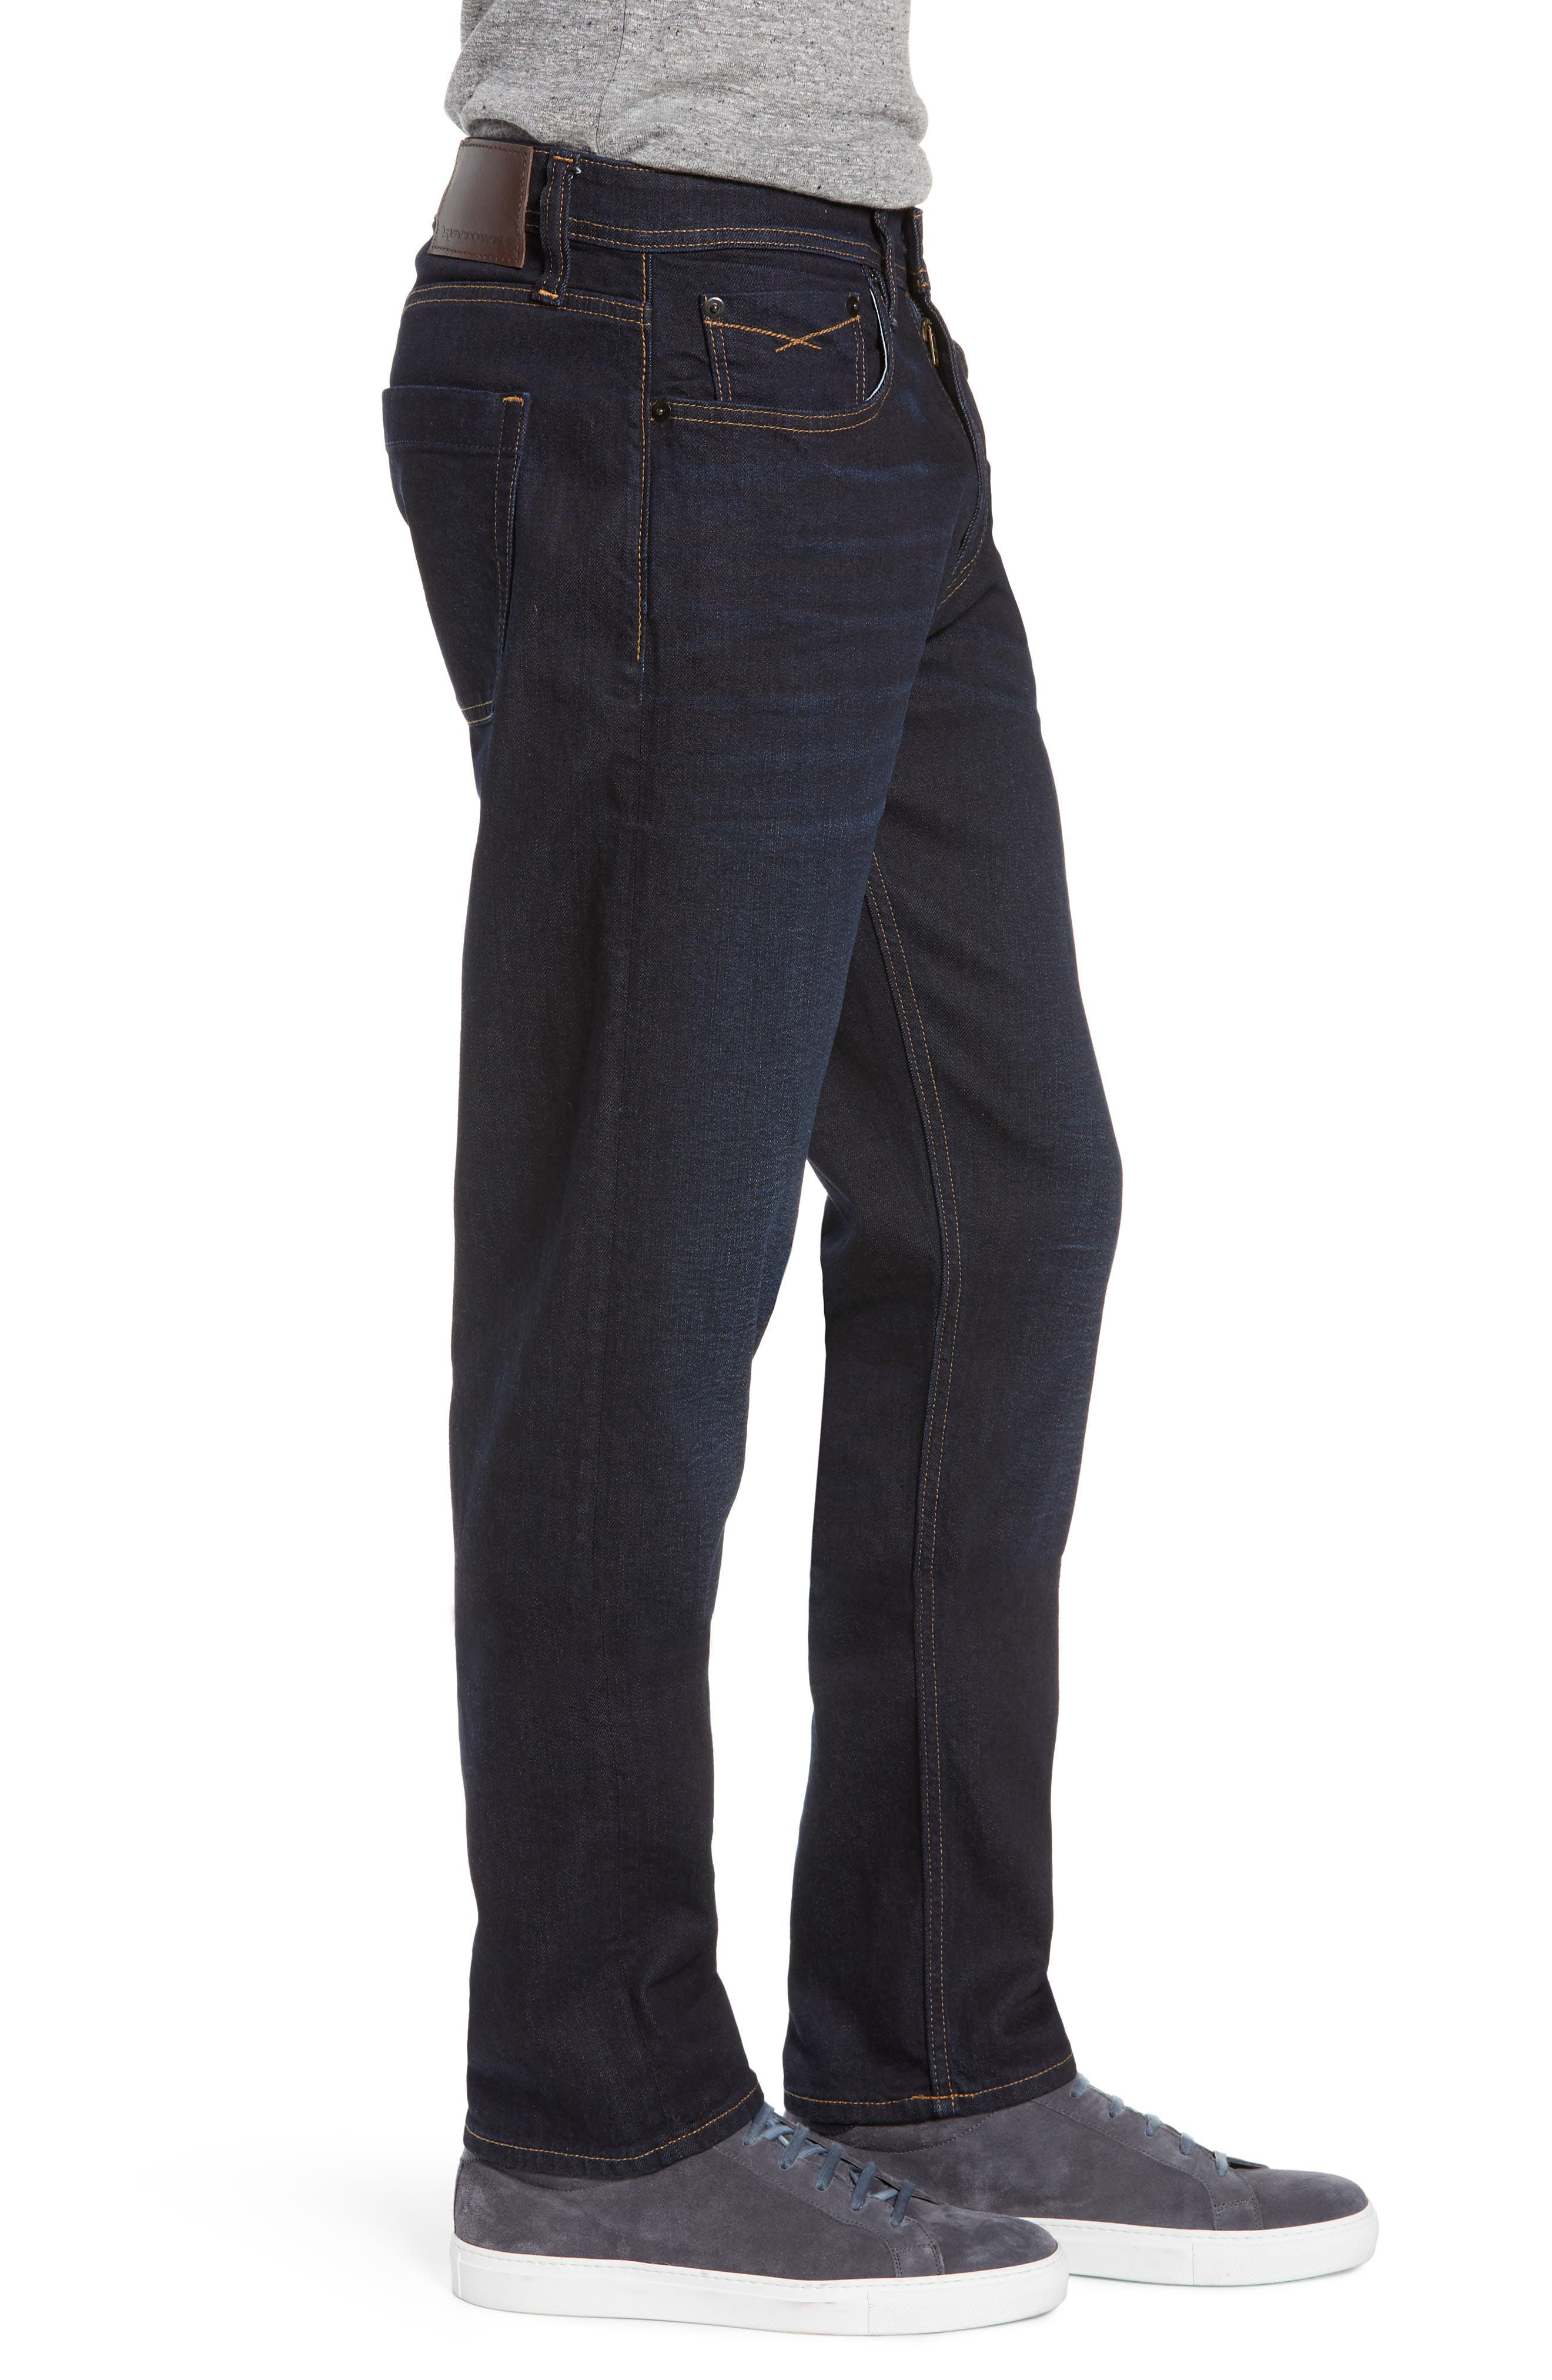 REVTOWN, Sharp Slim Fit Jeans, Alternate thumbnail 3, color, DARK INDIGO